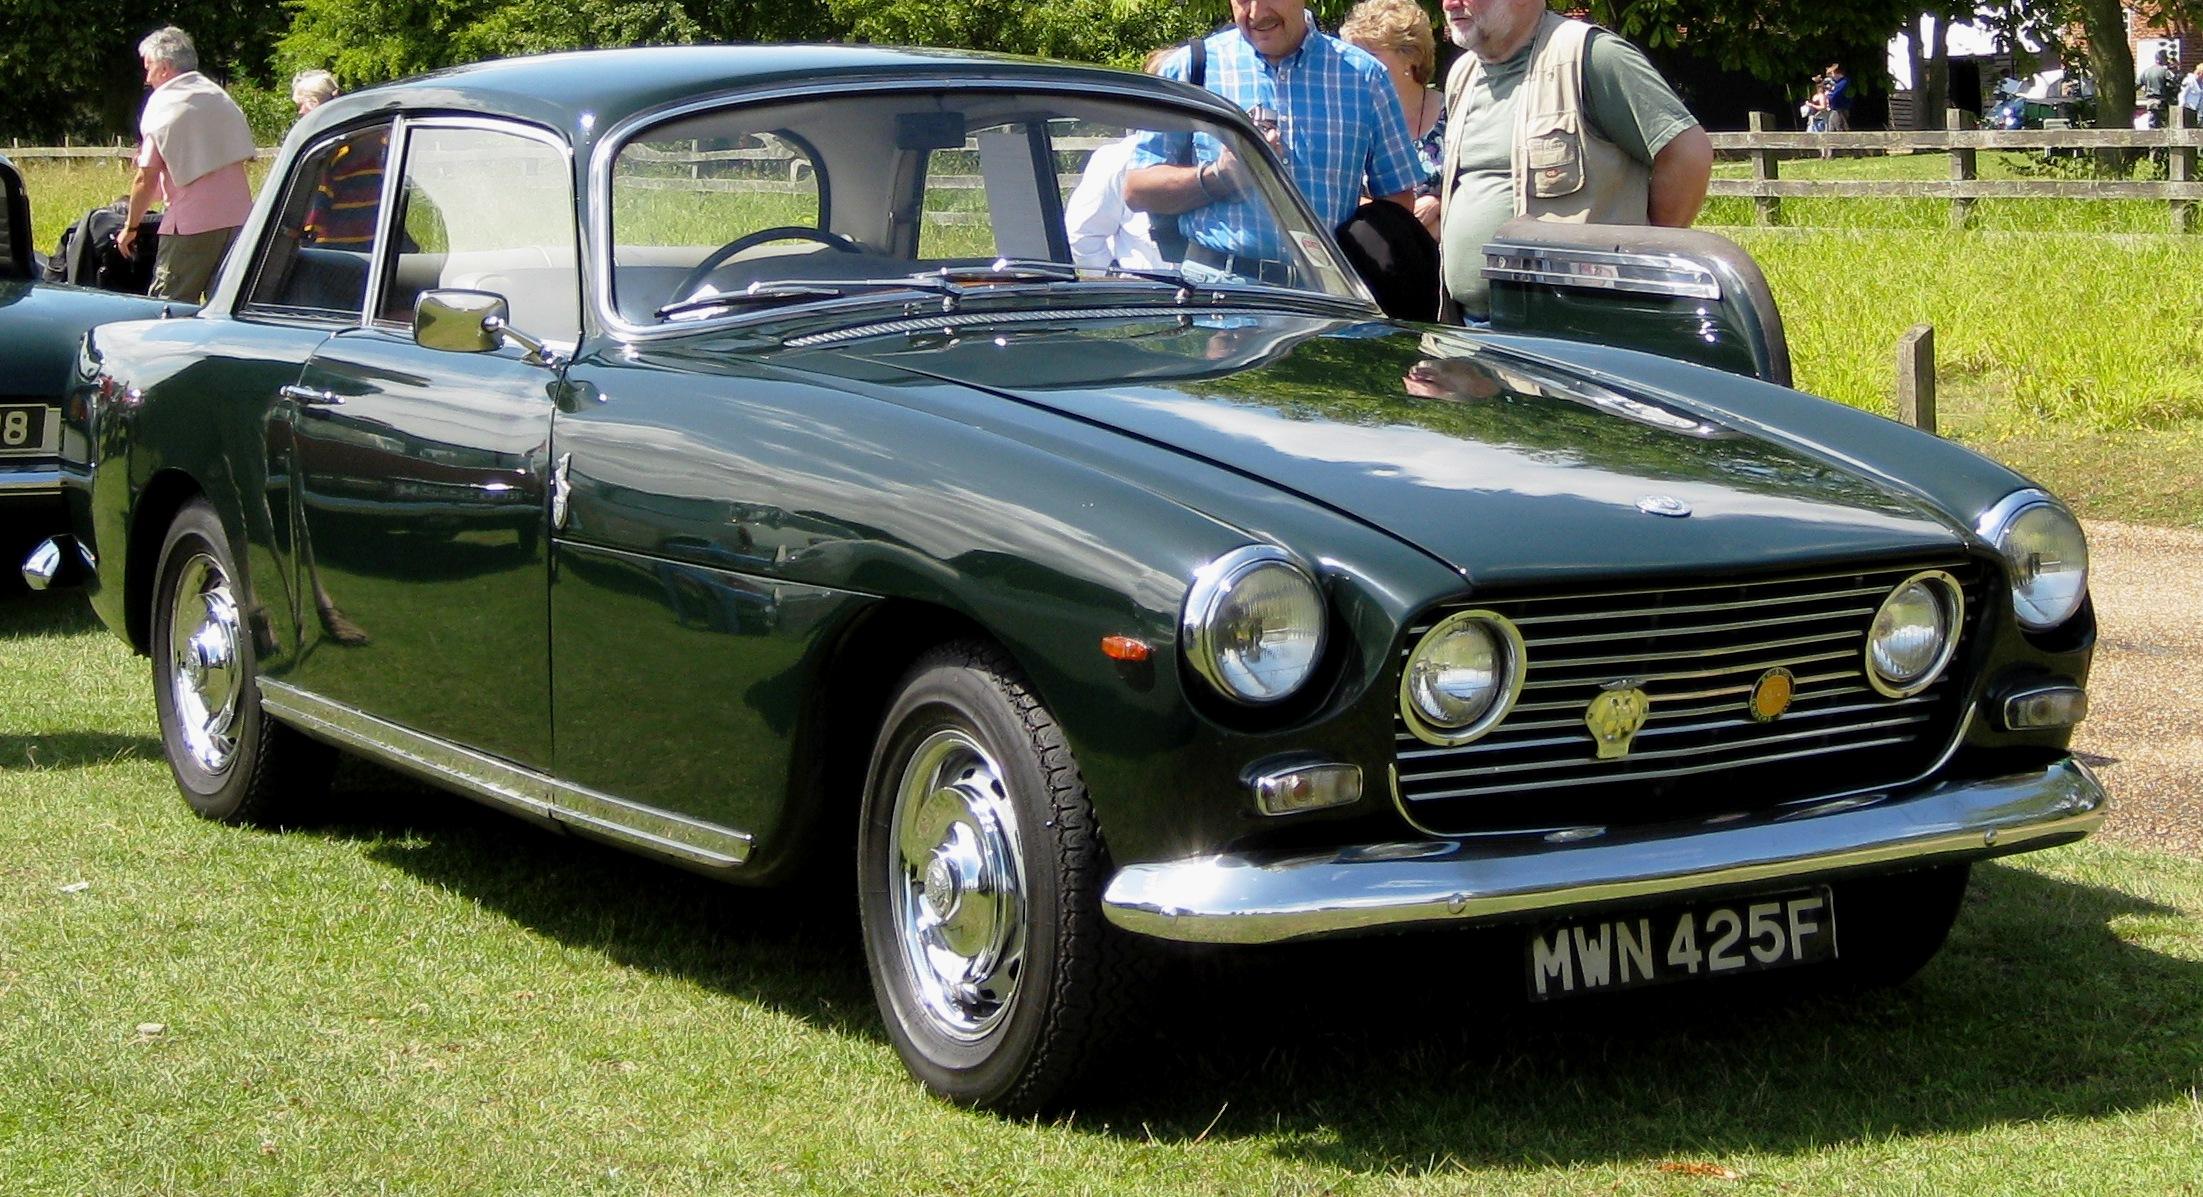 Bristol Used Cars Finance